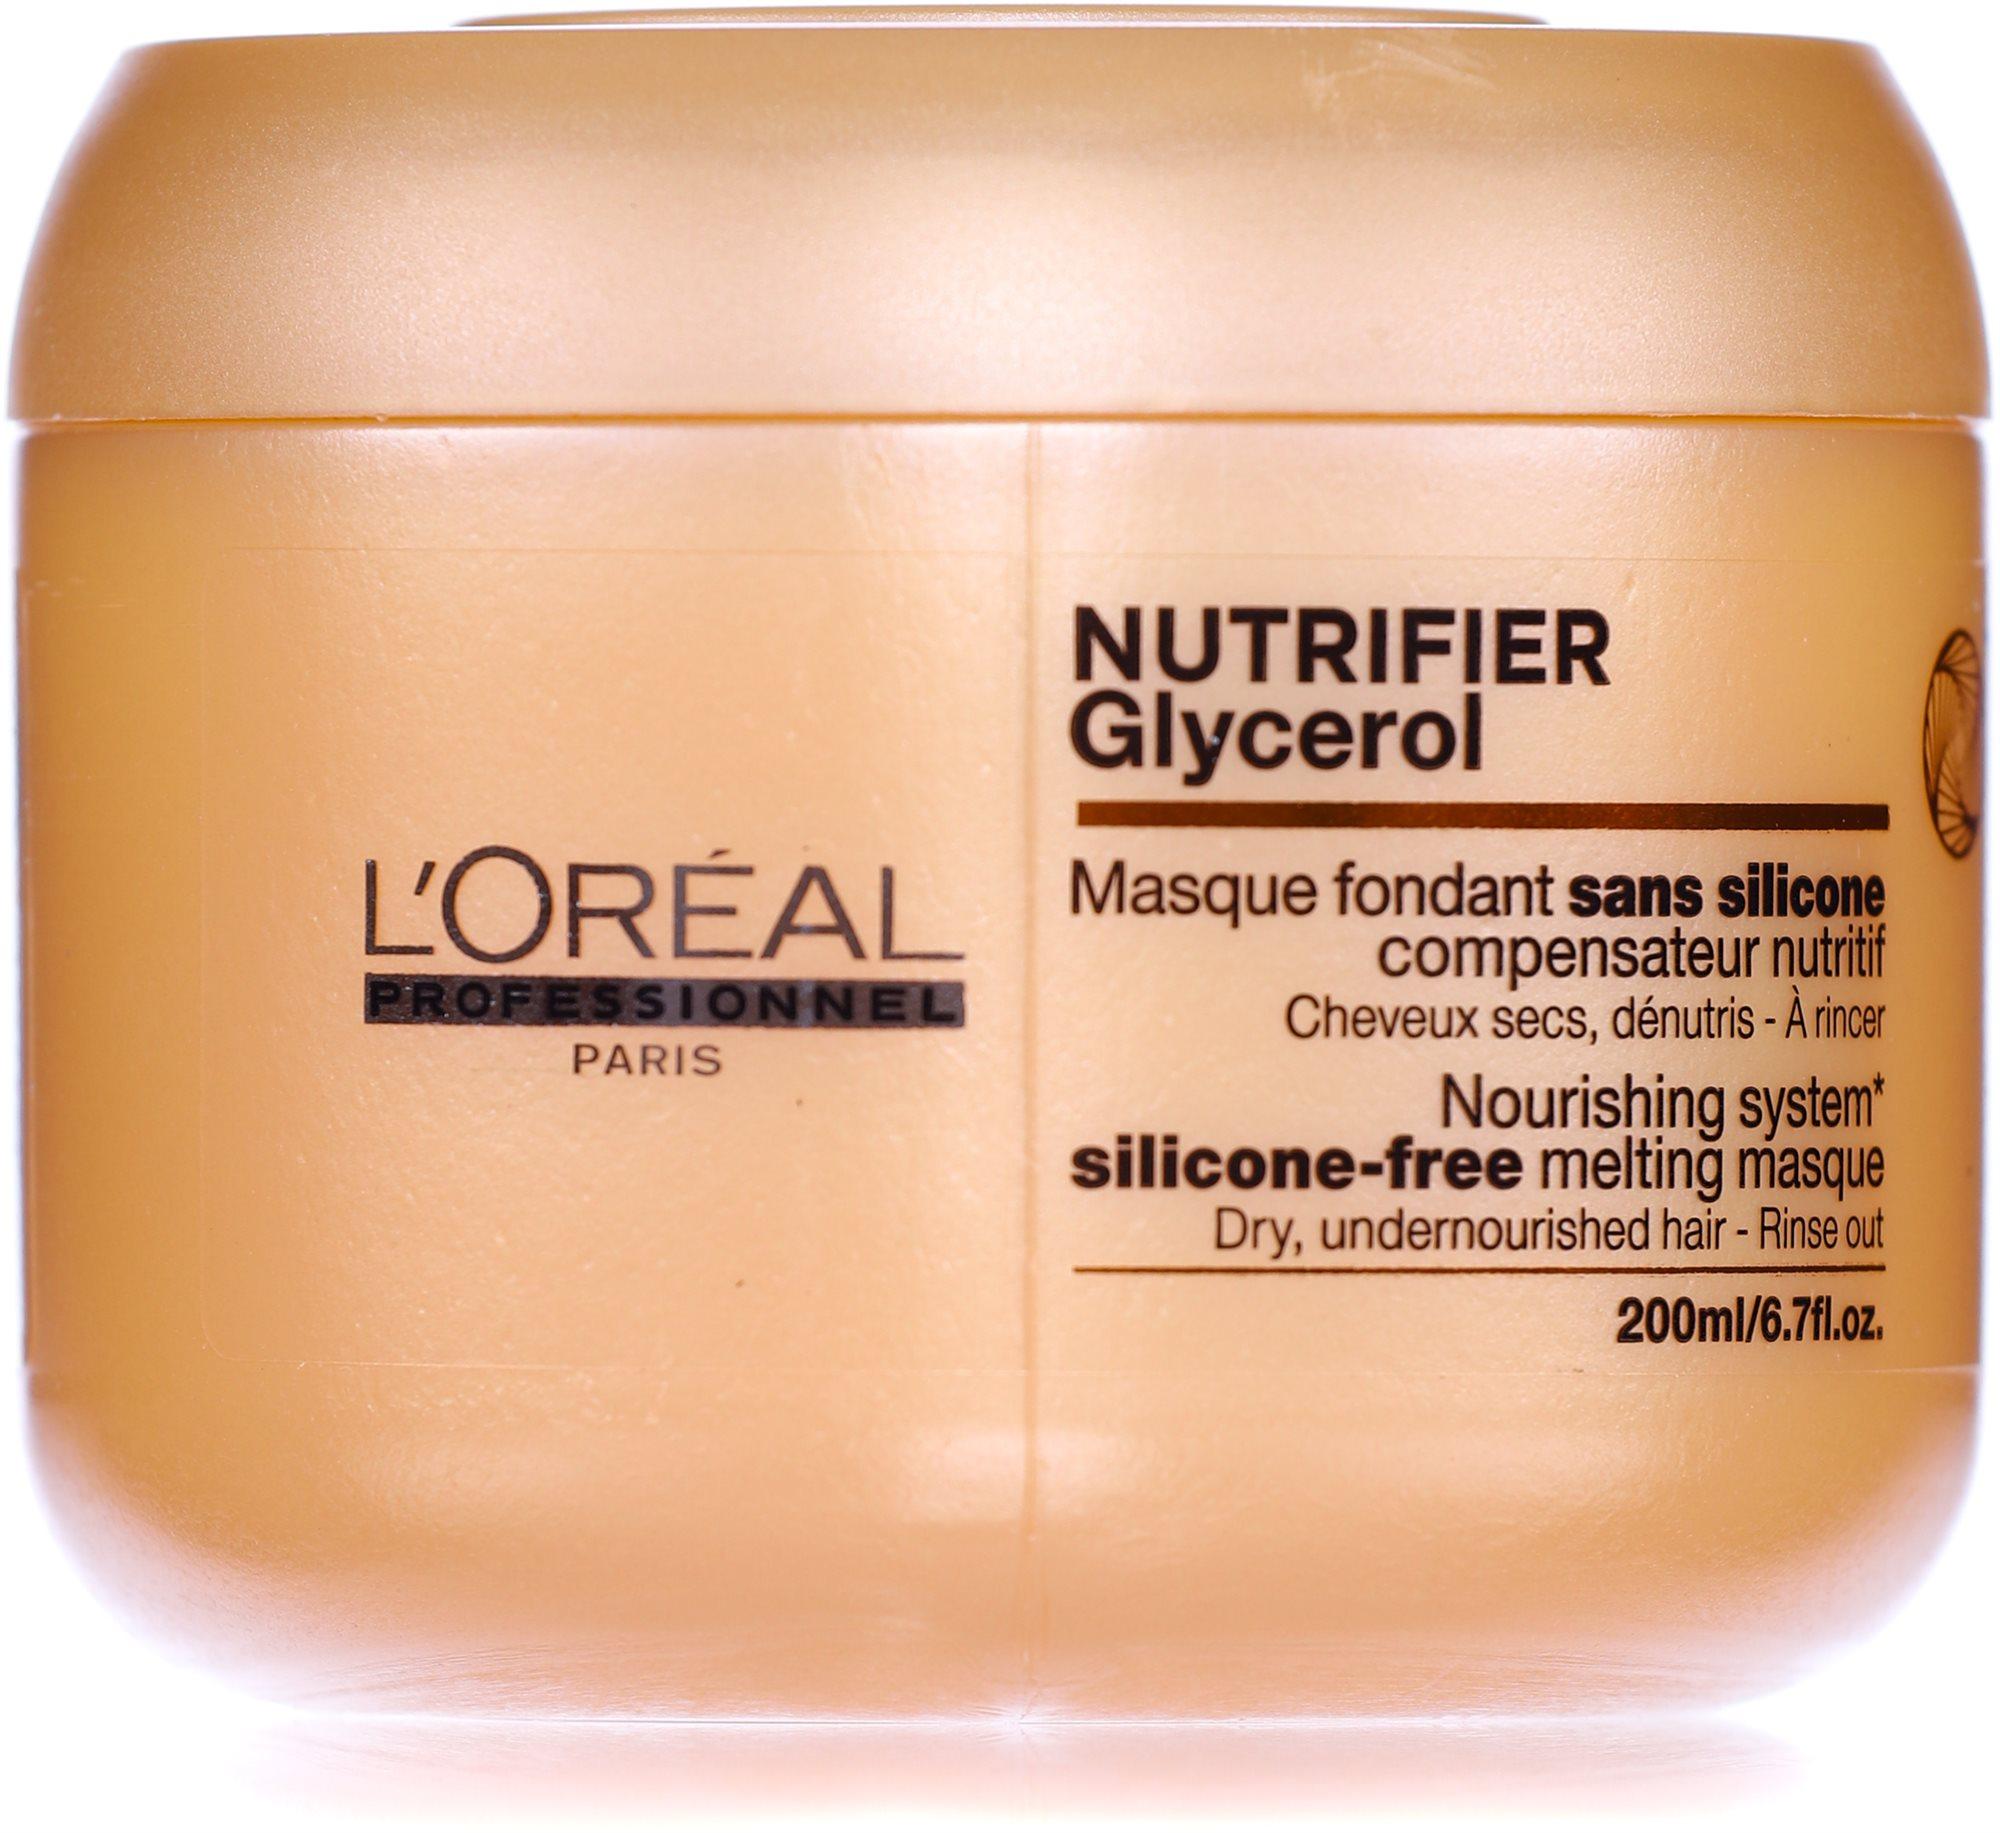 L'ORÉAL PROFESSIONAL Expert Nutrifier Mask Series 200 ml